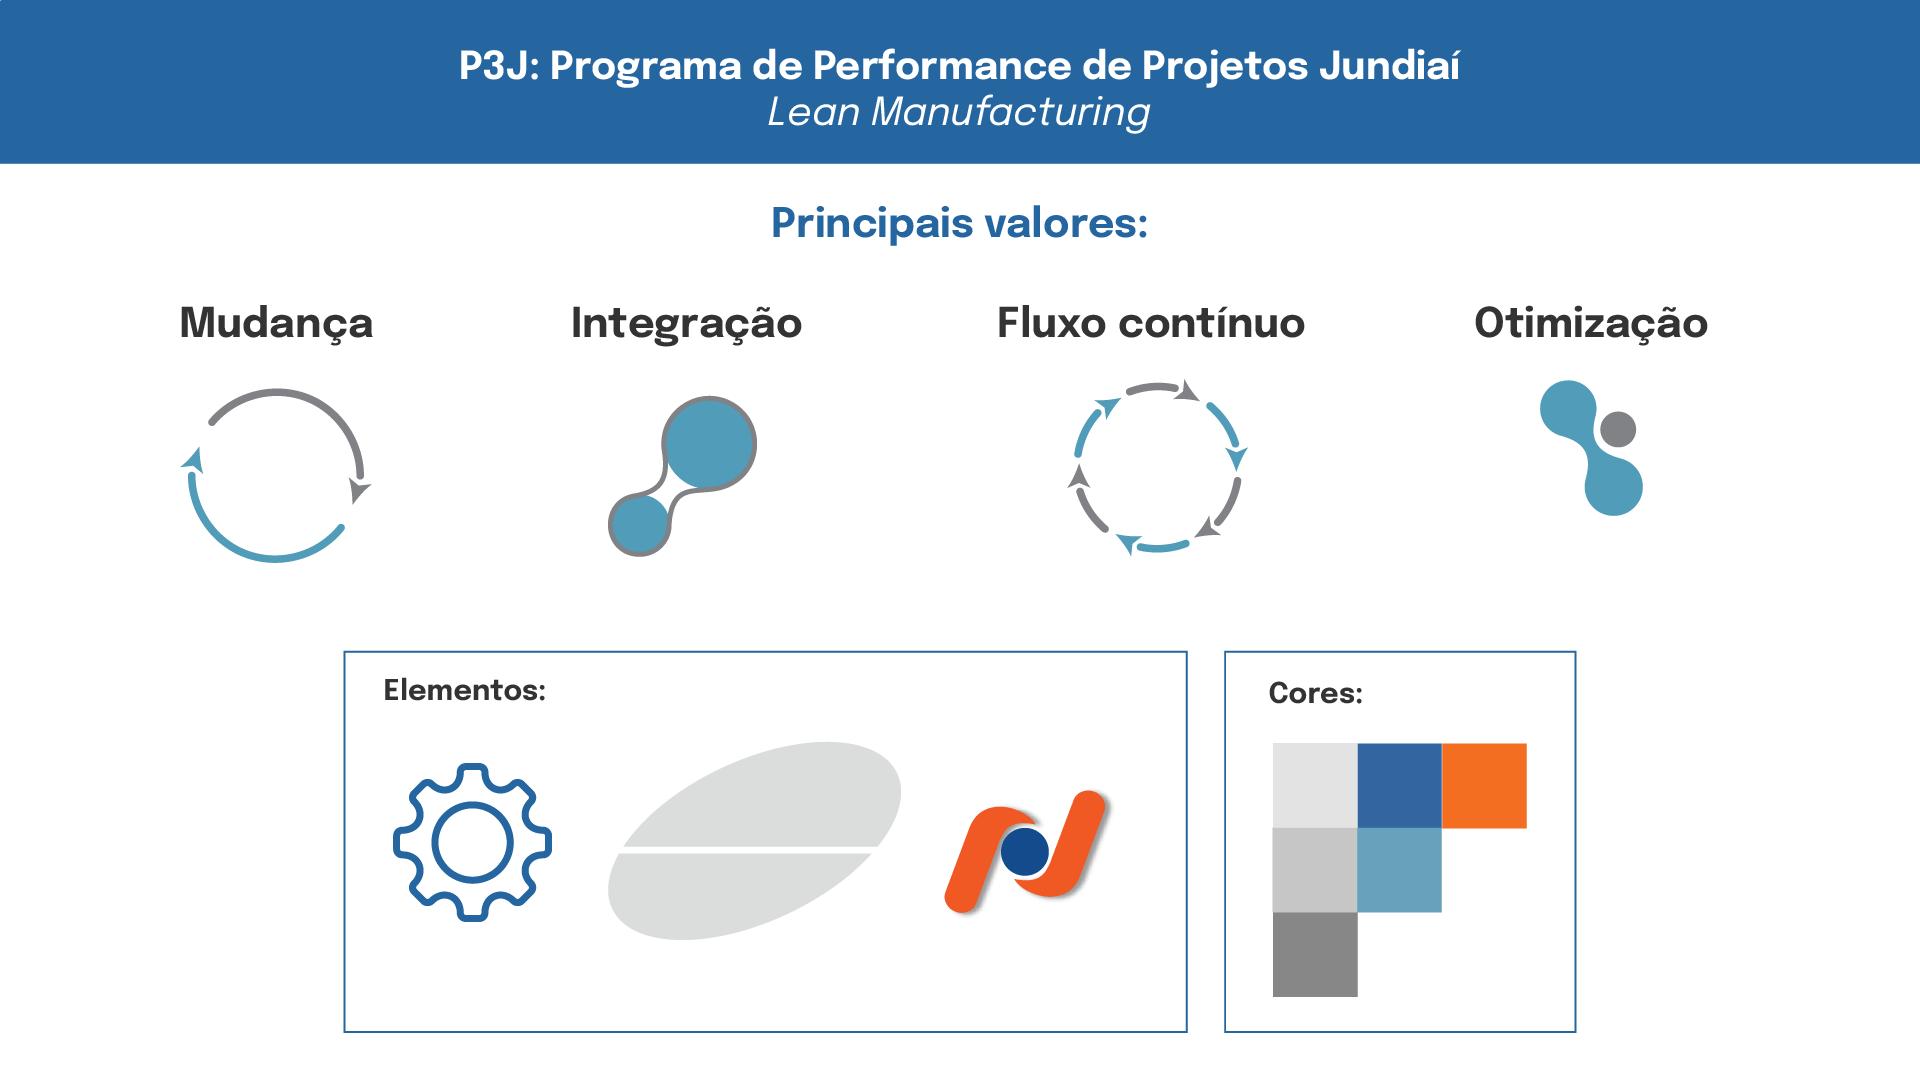 P3J - Estudo